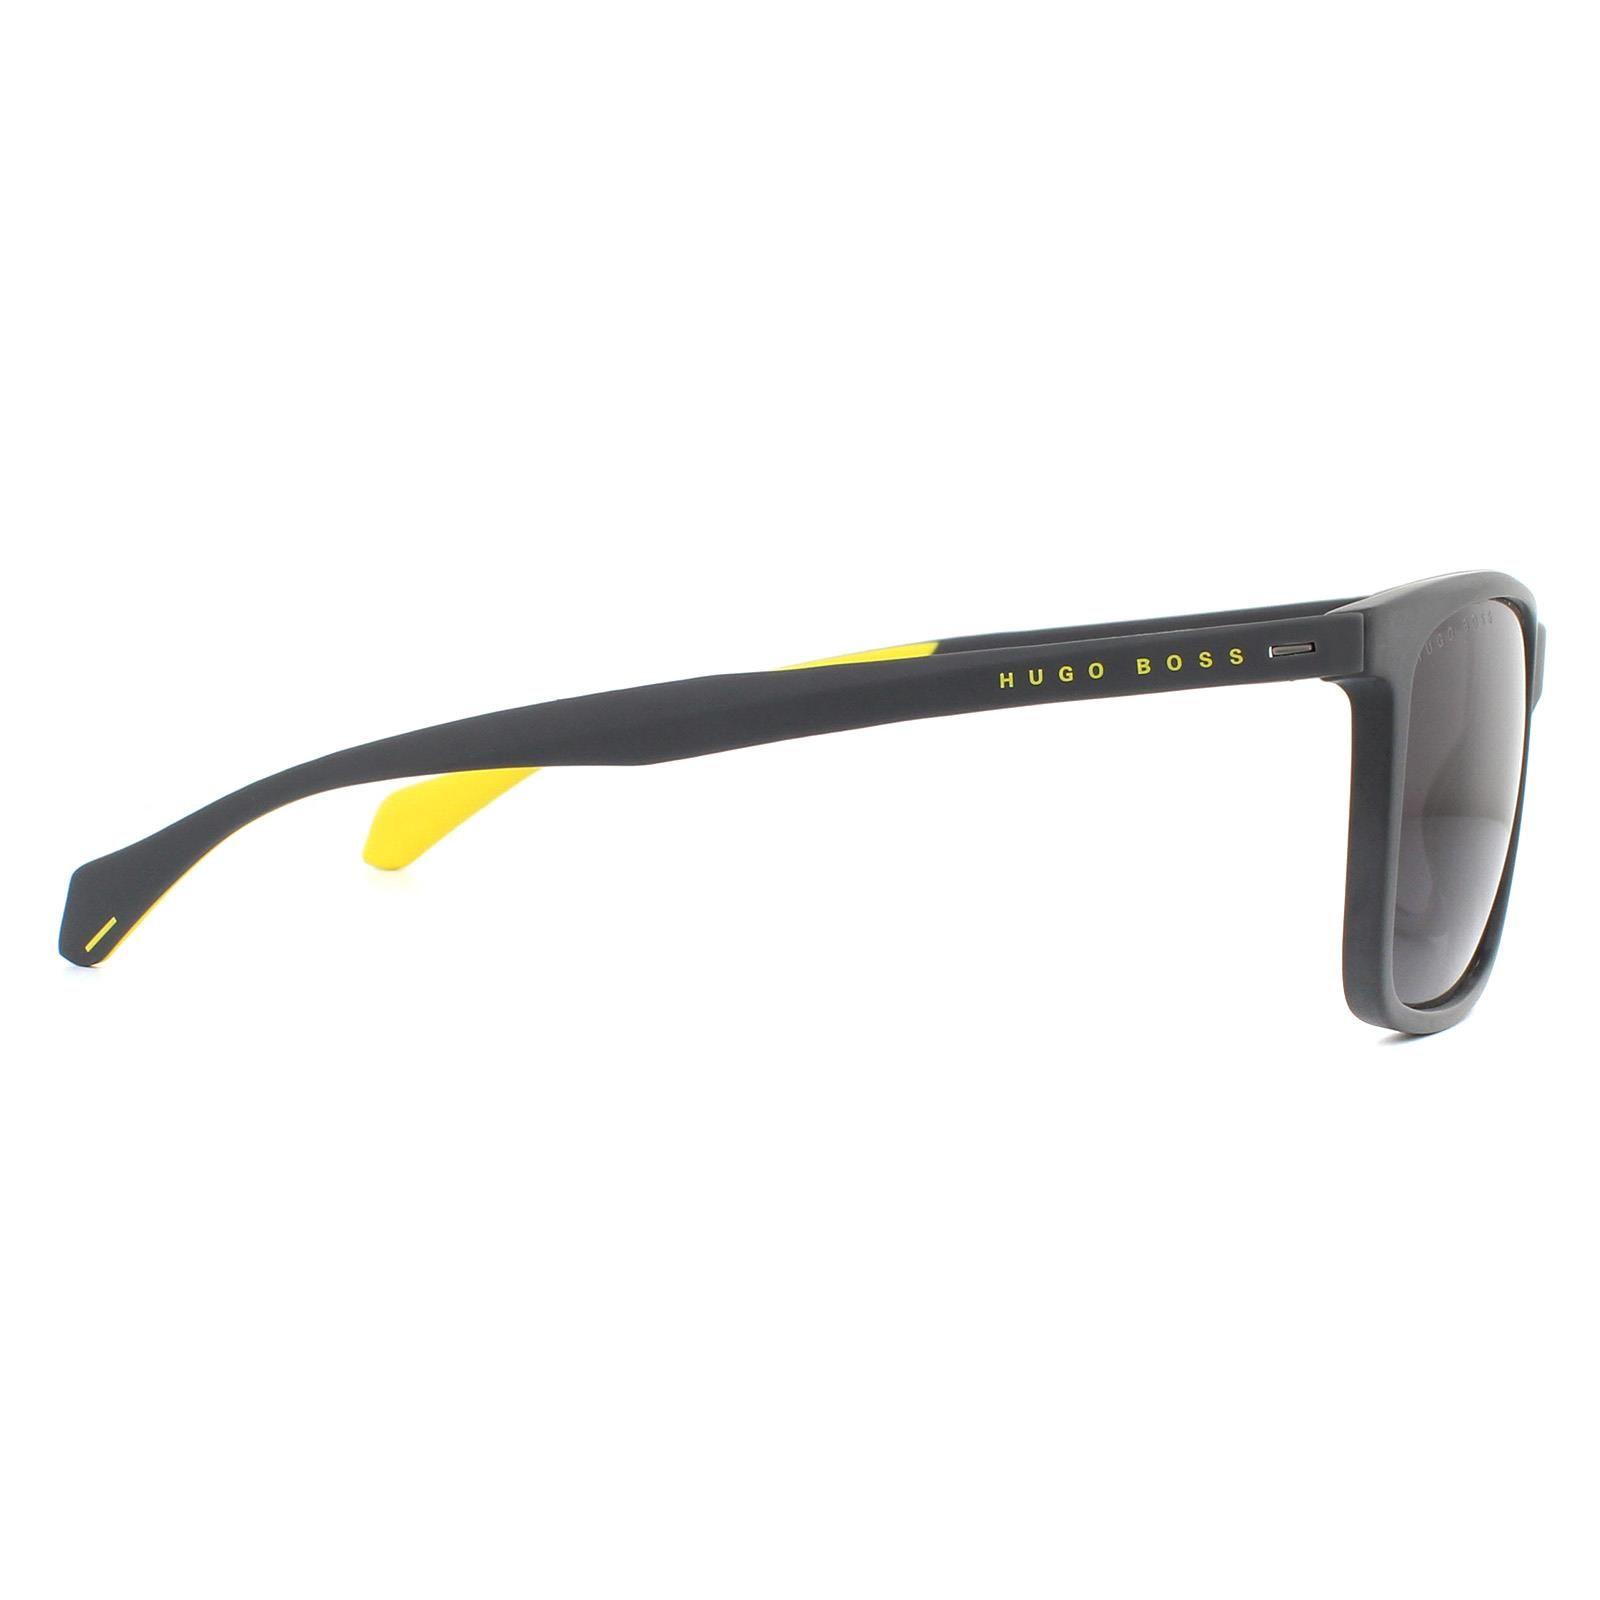 Hugo Boss Sunglasses BOSS 1078/S FRE/M9 Matte Grey Grey Polarized